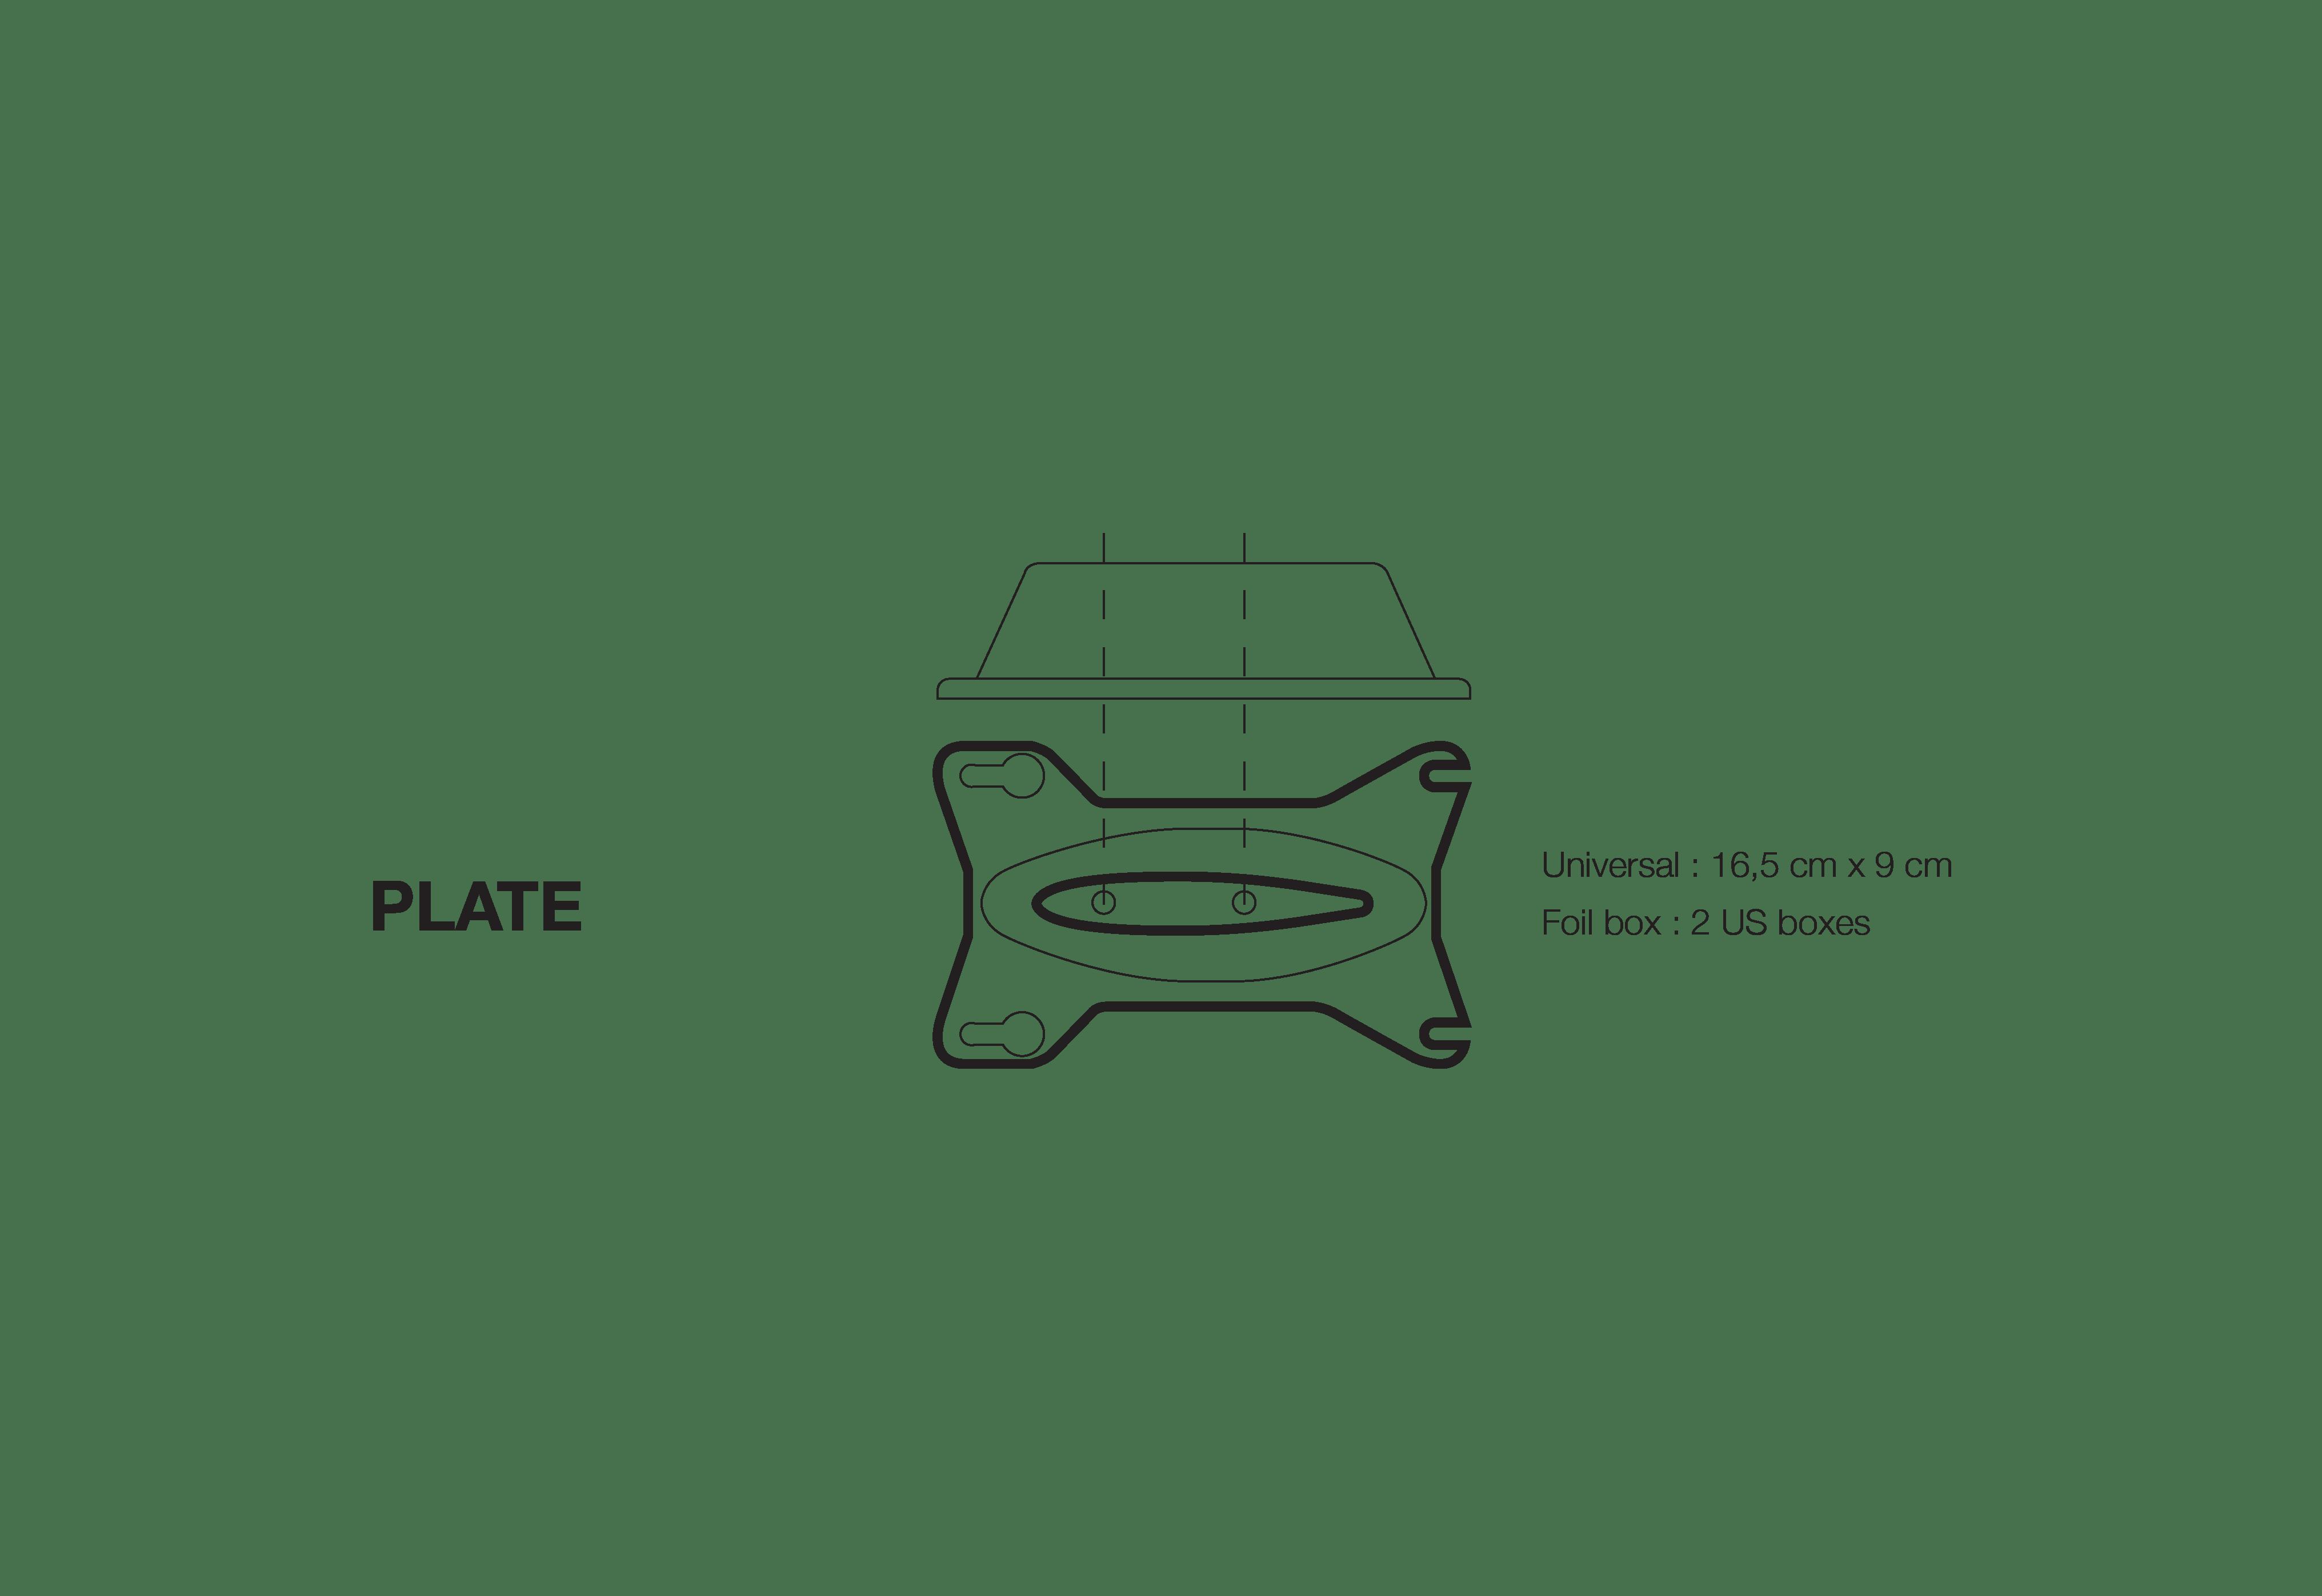 HCS_PLATE